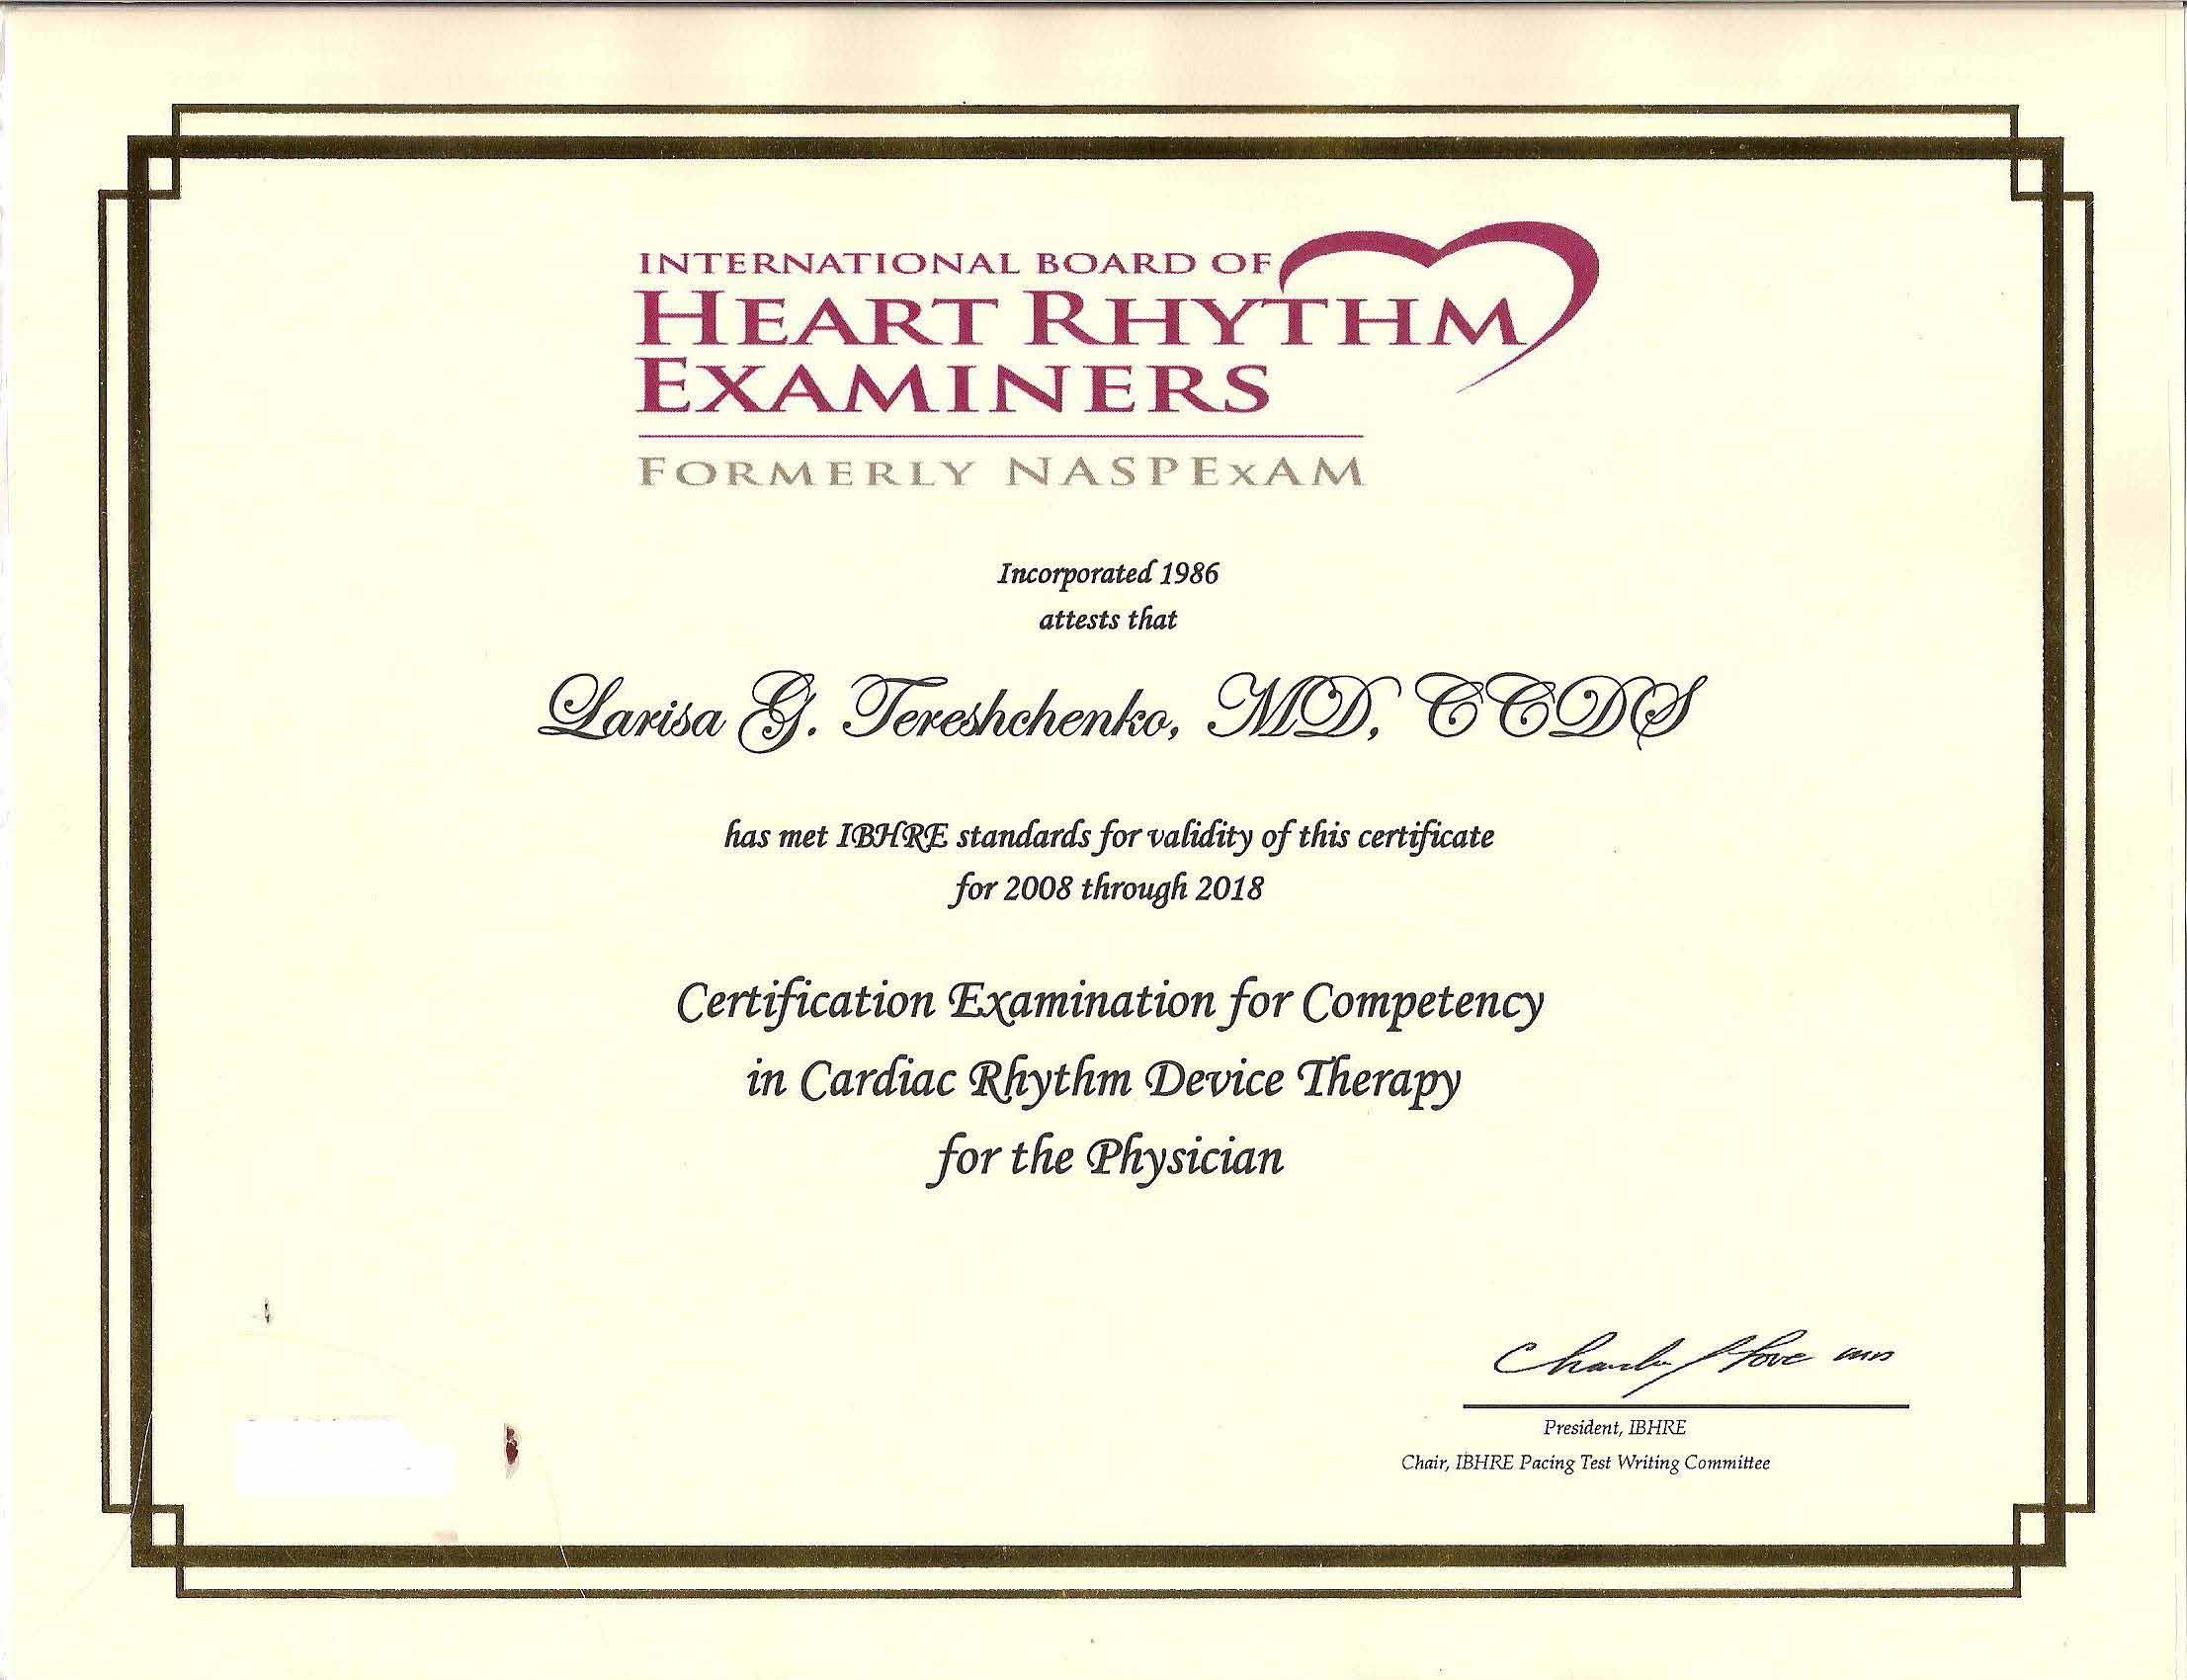 CCDS certificate